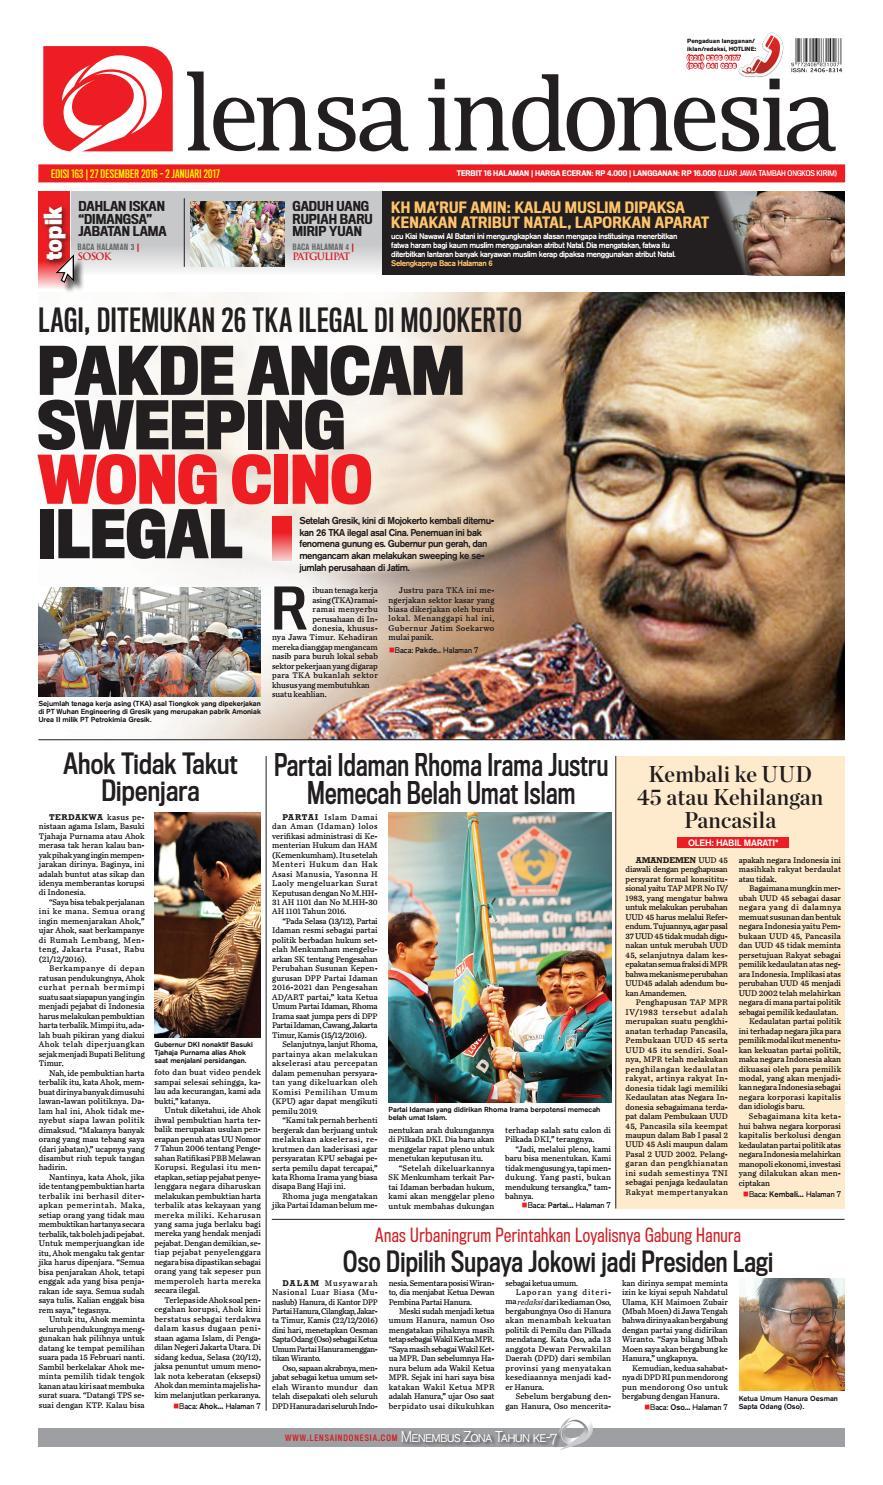 Koran Lensa Indonesia Edisi 163 by Koran Lensa Indonesia - issuu 6005a6bda5